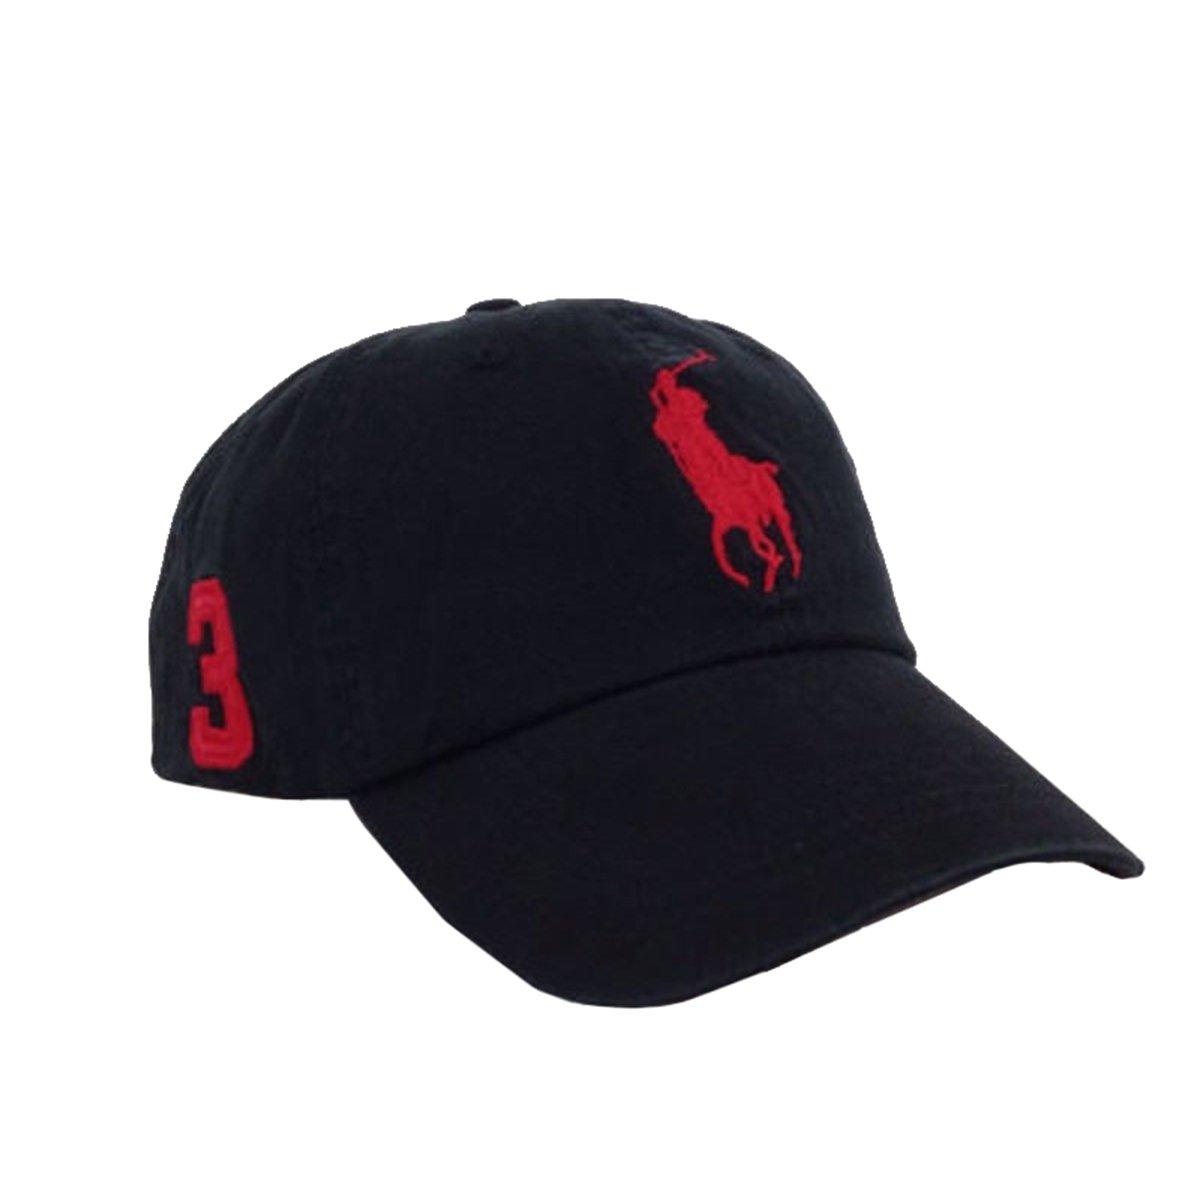 Generic Stylish Polo Fine Embroidery Big Pony Adjustable Unisex Baseball Summer Cap Hats (Black w/red)